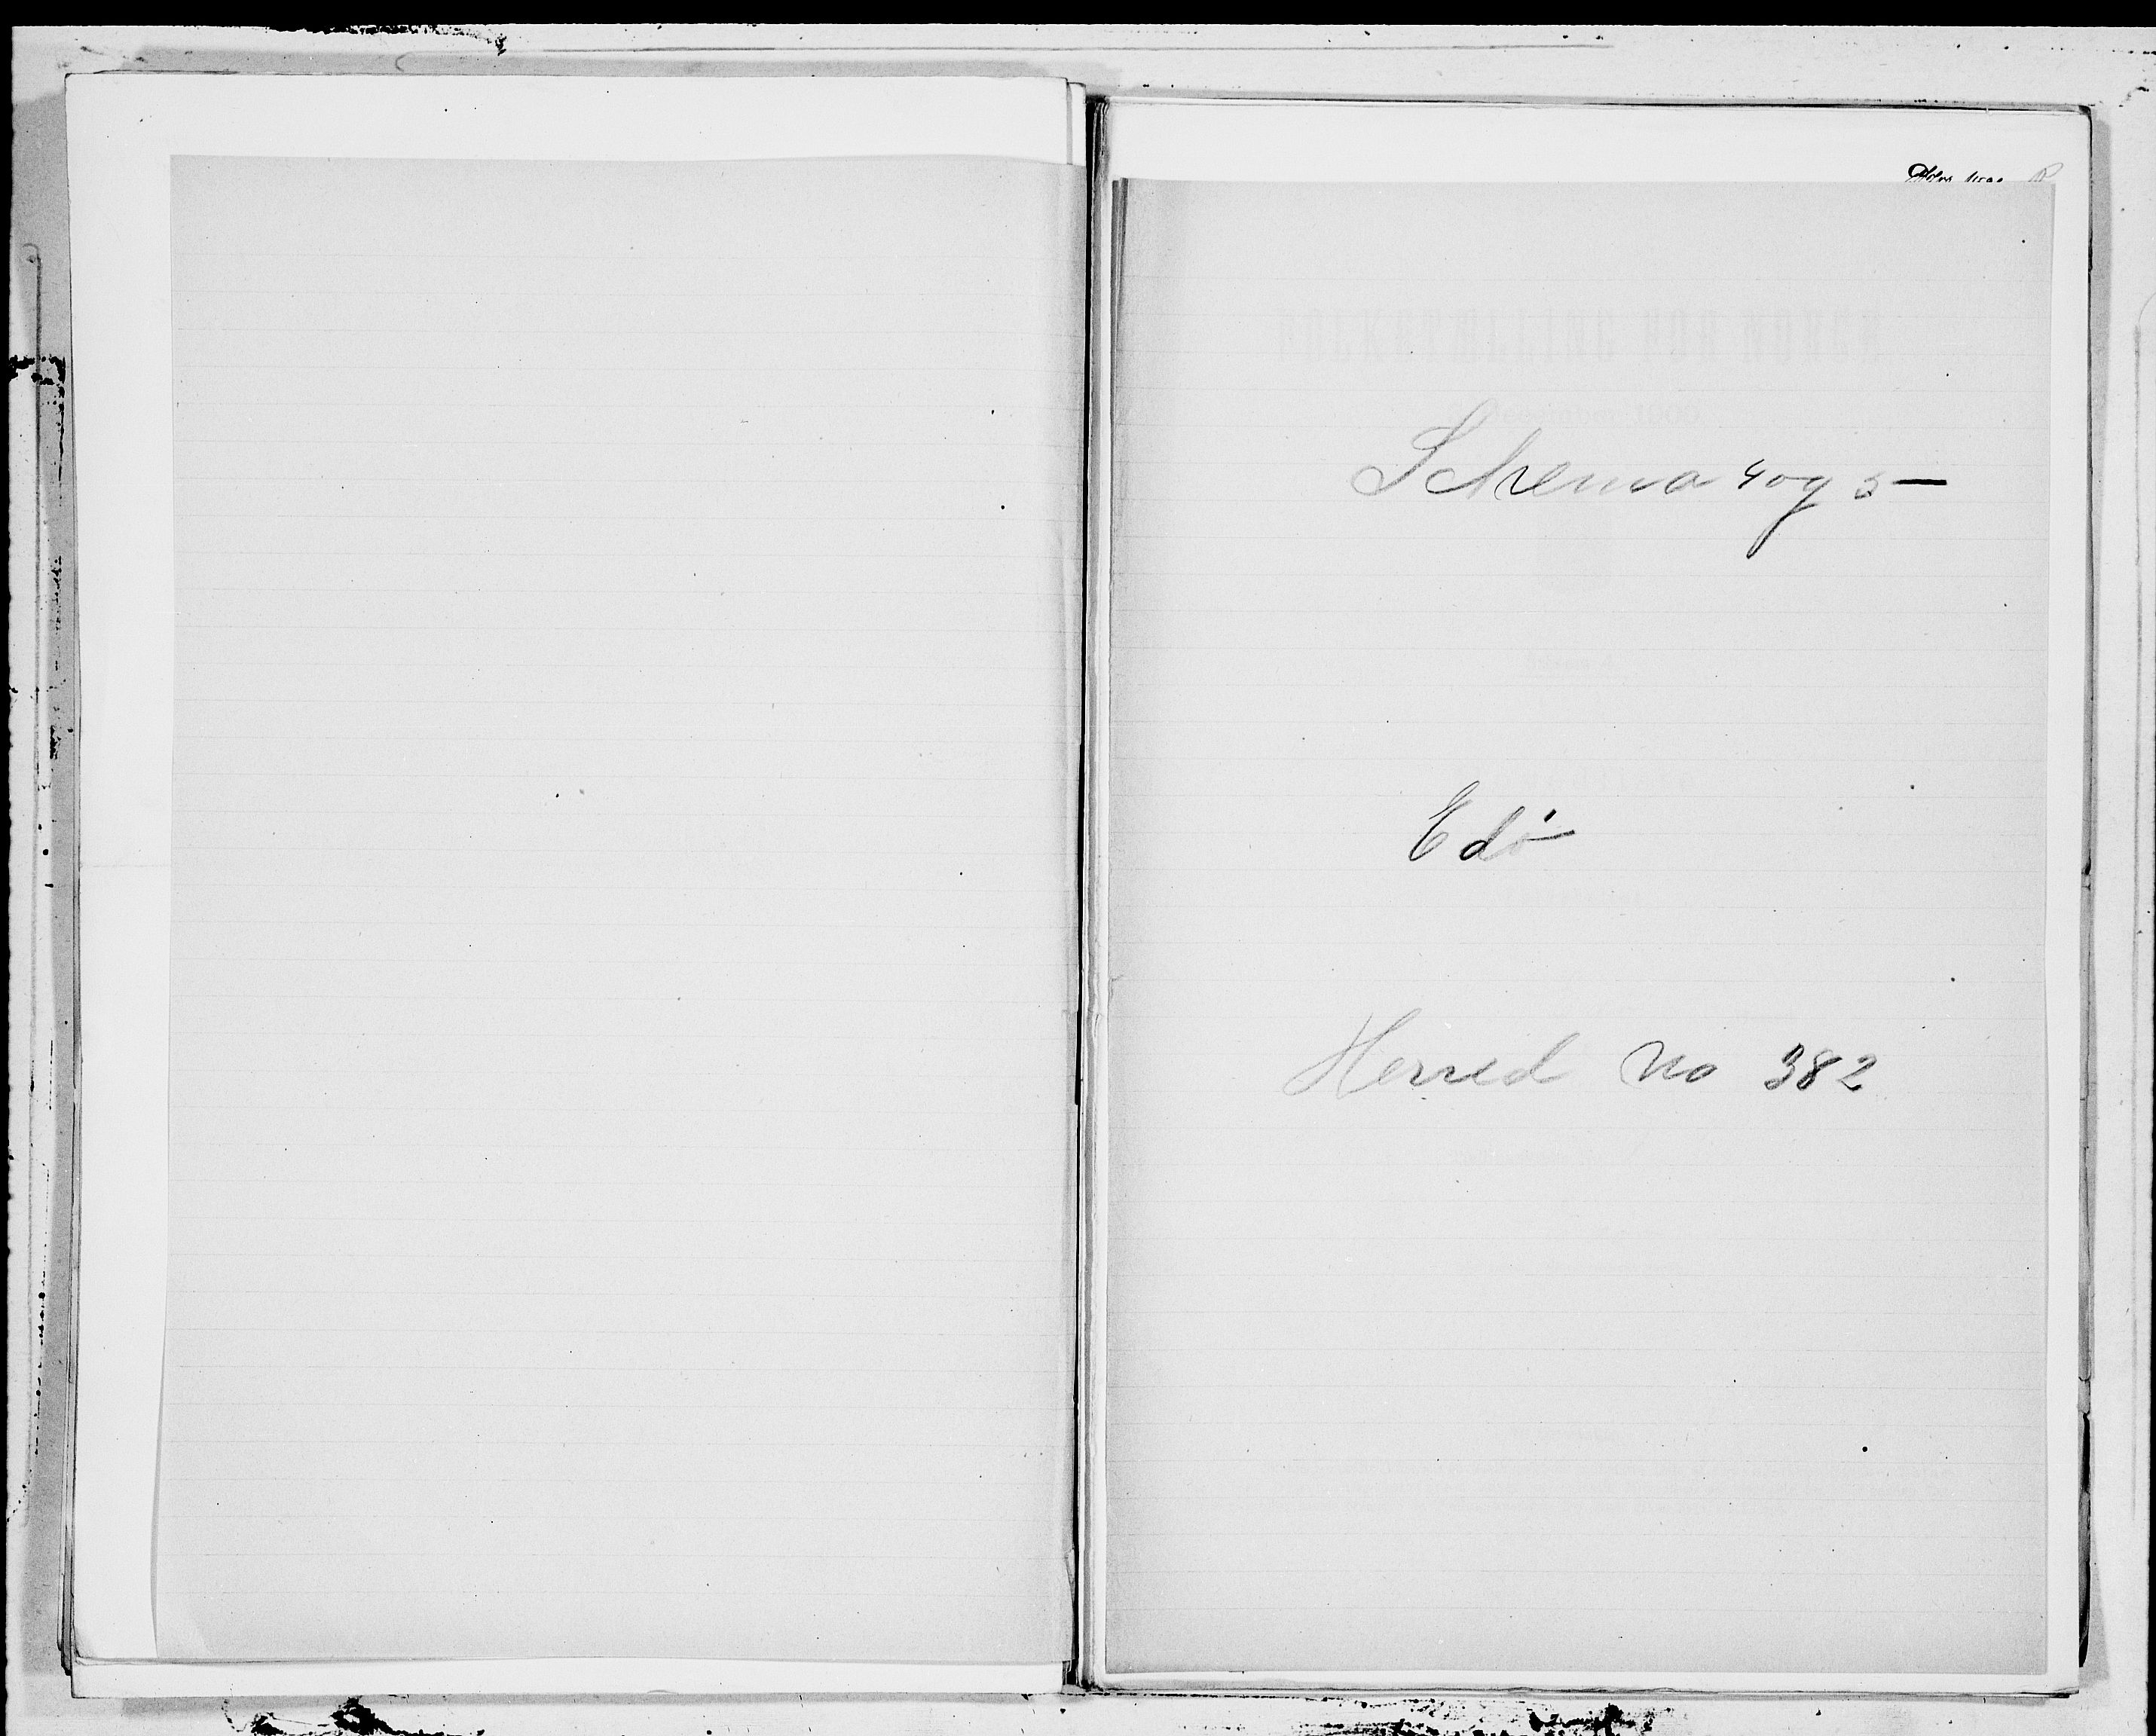 SAT, 1900 census for Edøy, 1900, p. 1